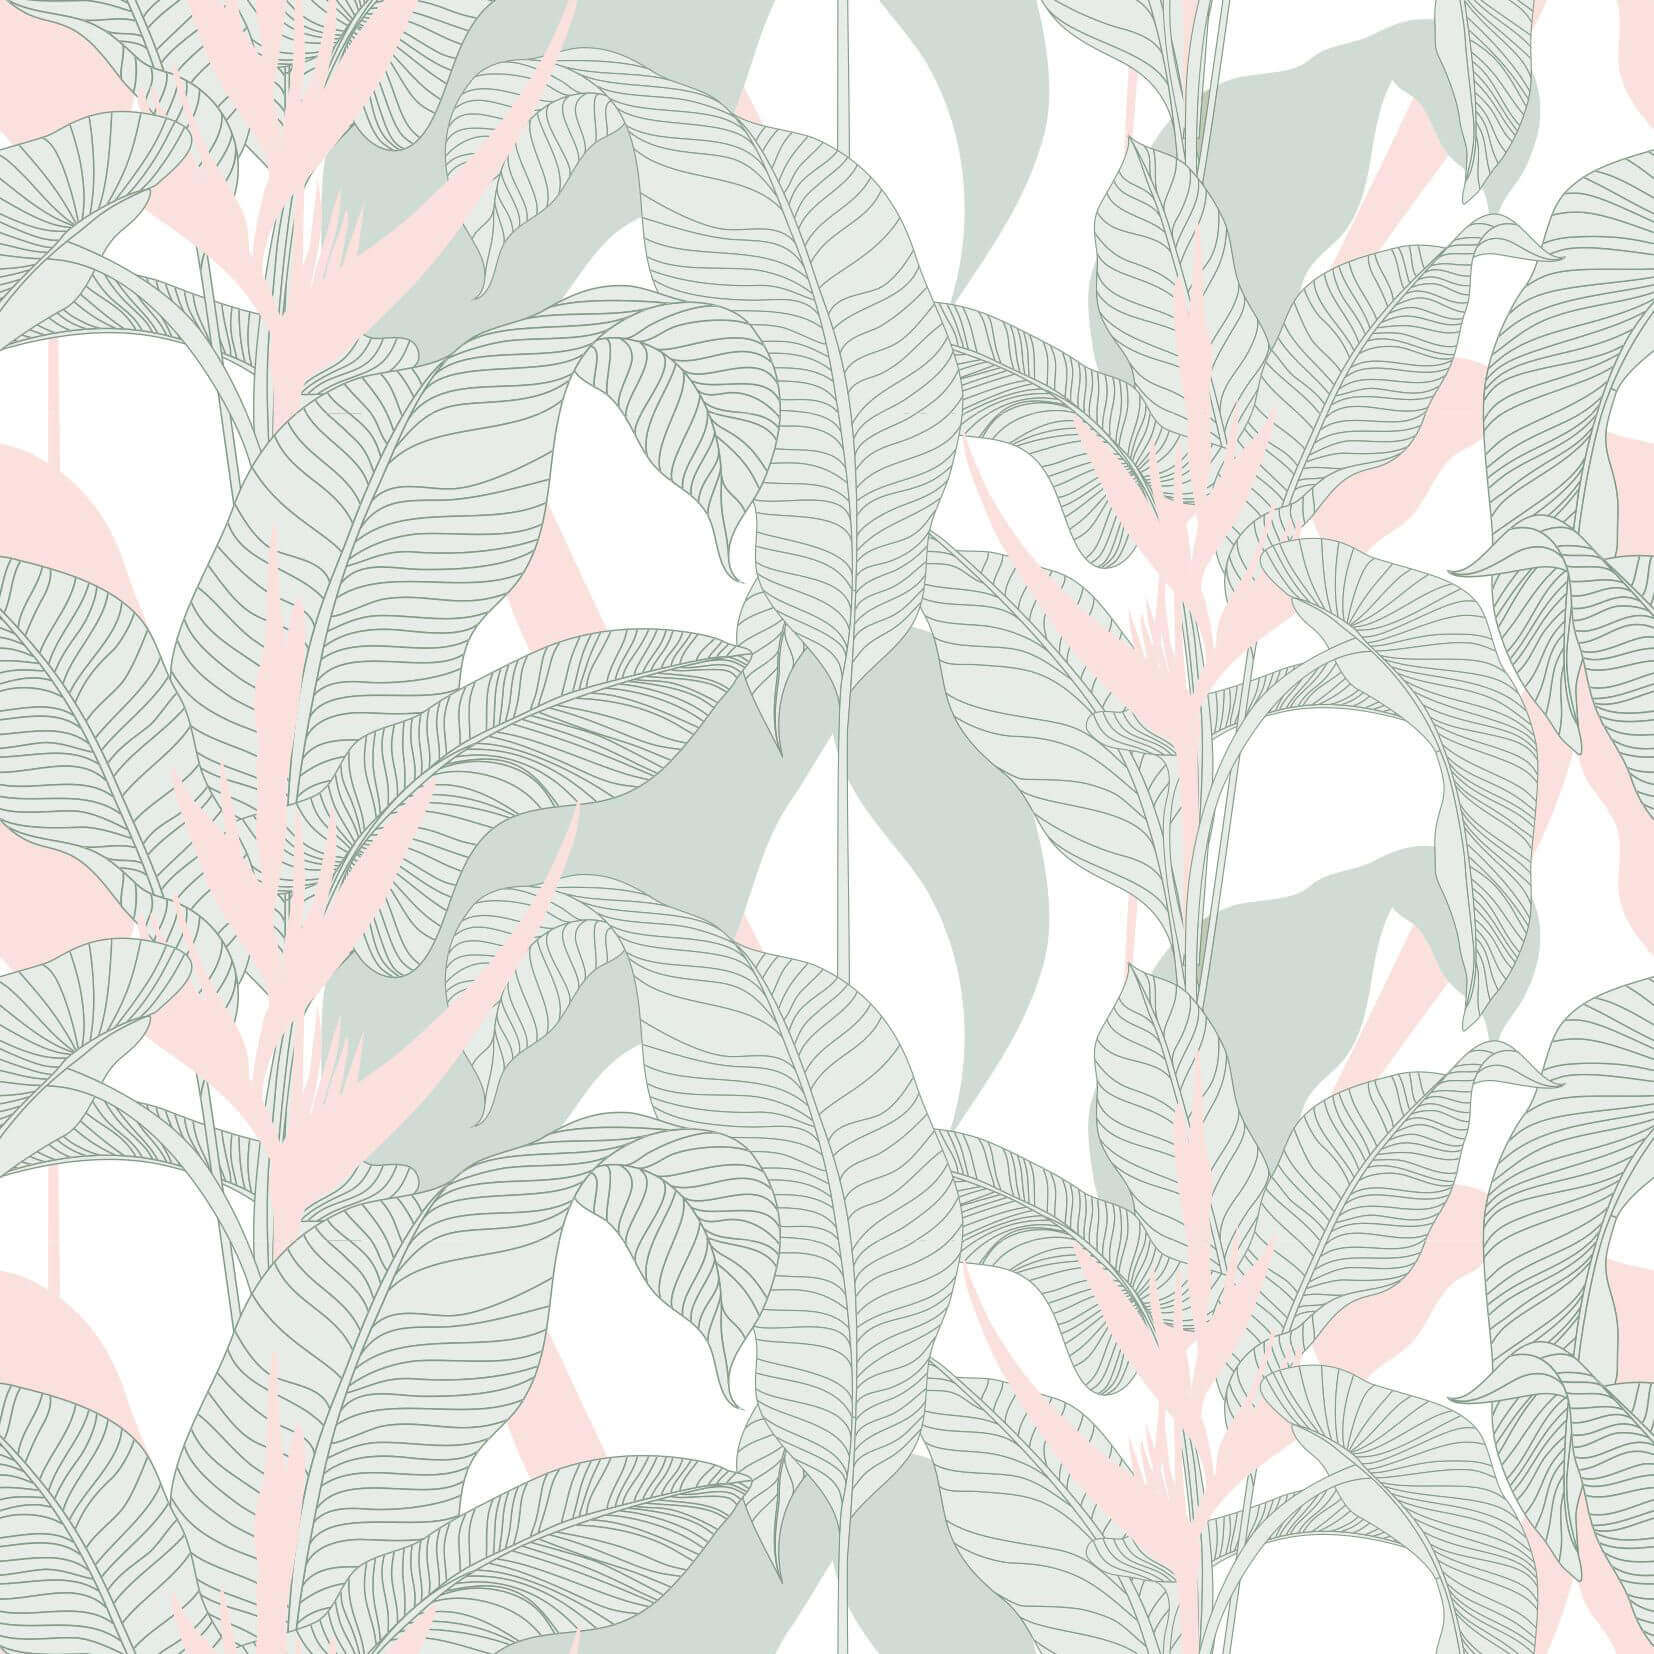 Papel de parede folhagem tropical